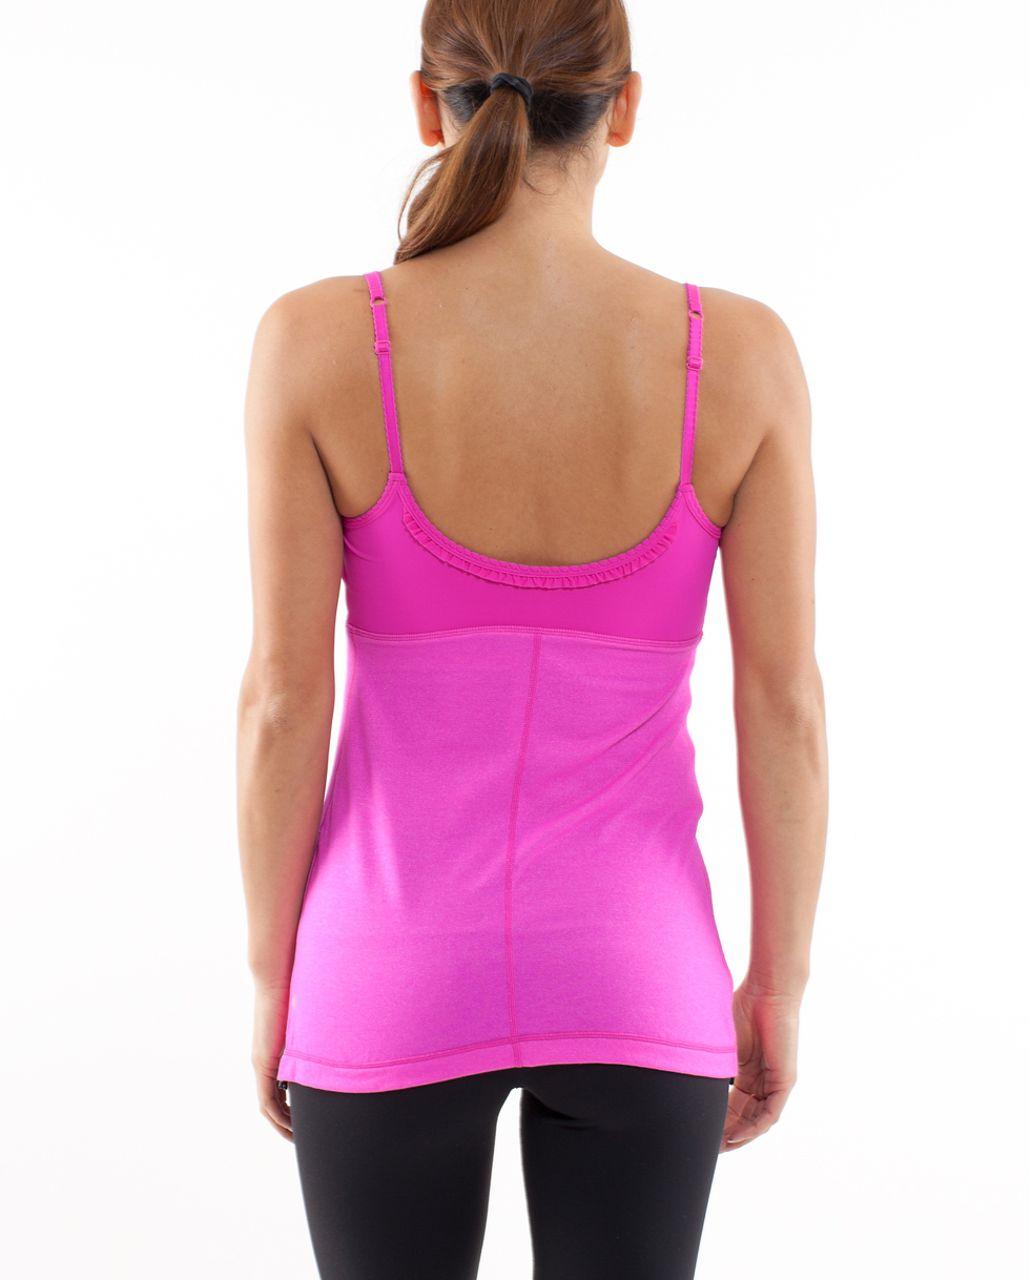 Lululemon Hot 'N Sweaty Tank - Paris Pink